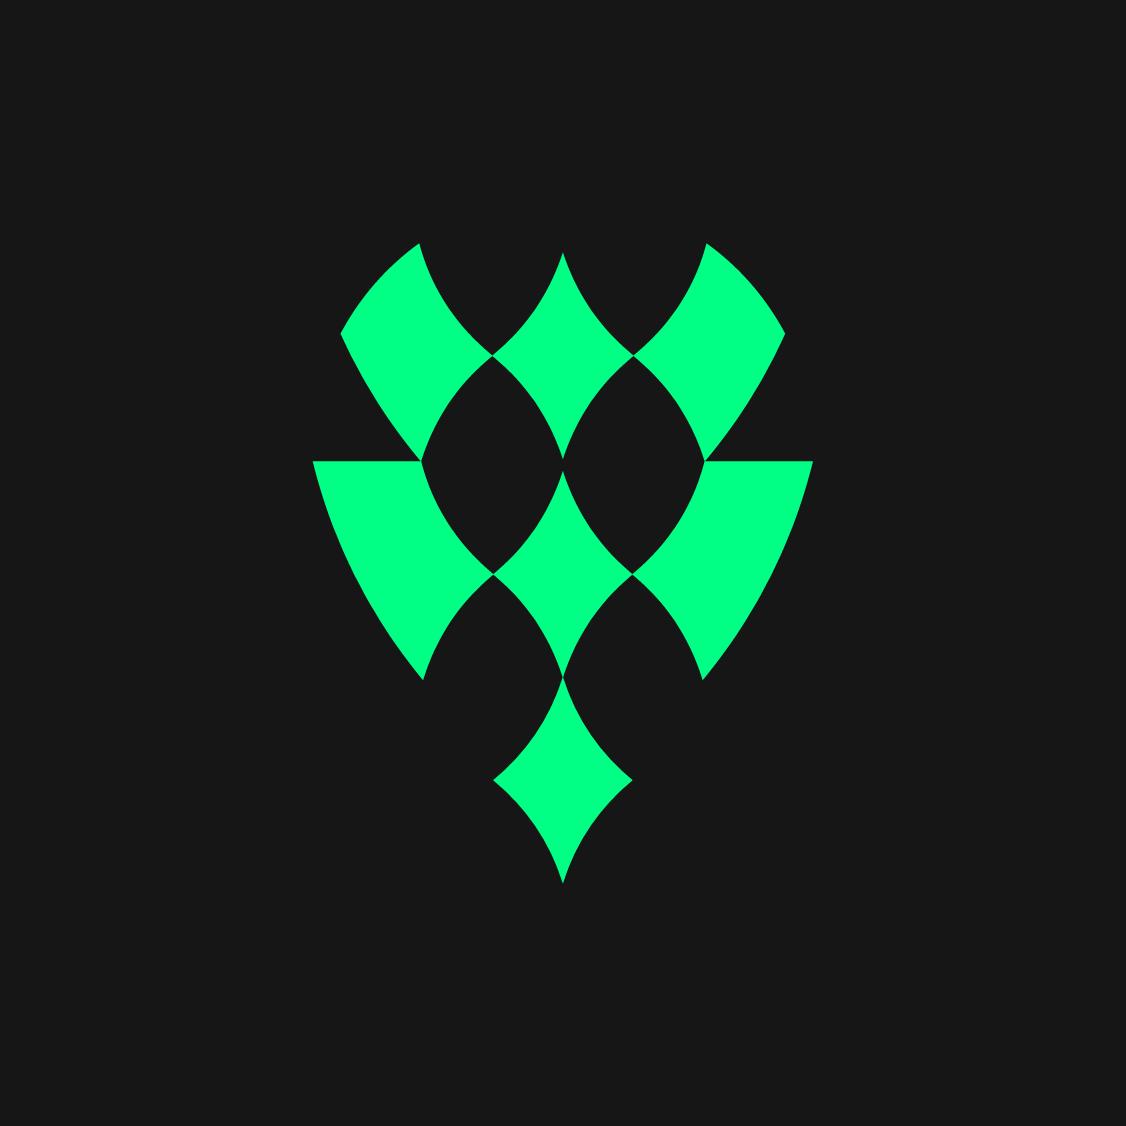 all-logos-2020-37